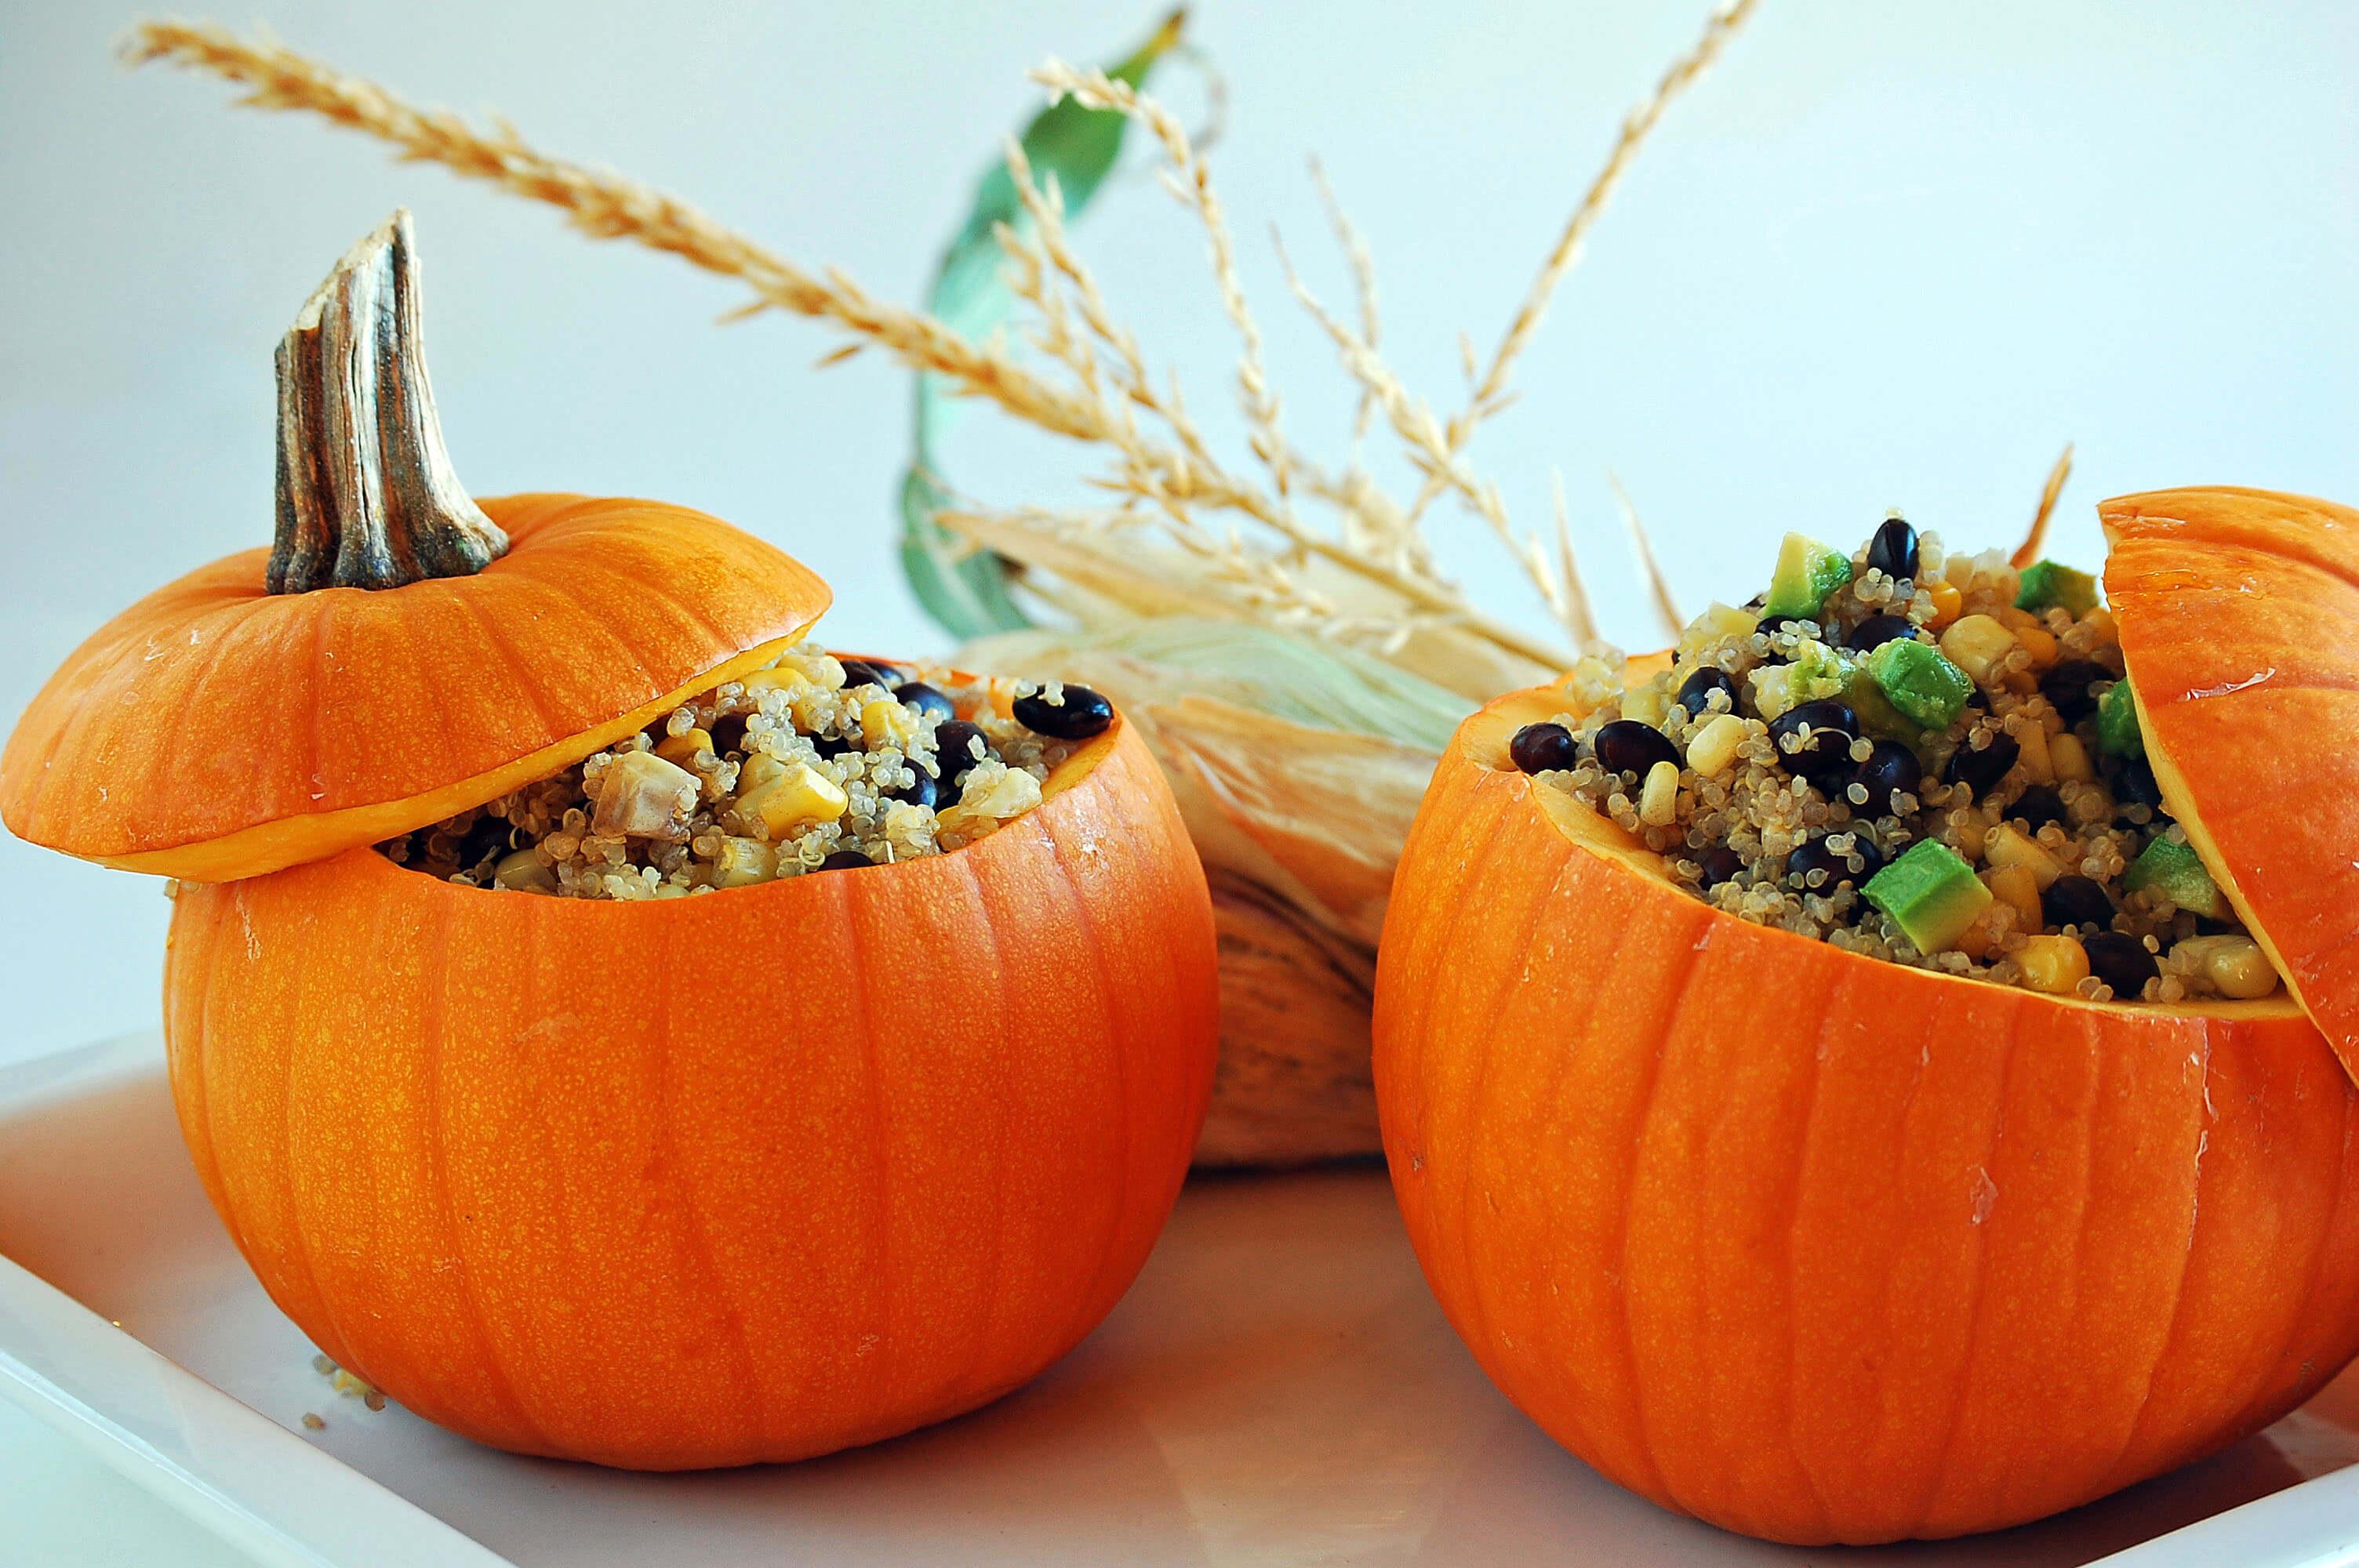 DIY pumpkin bowl for any interior kitchen table